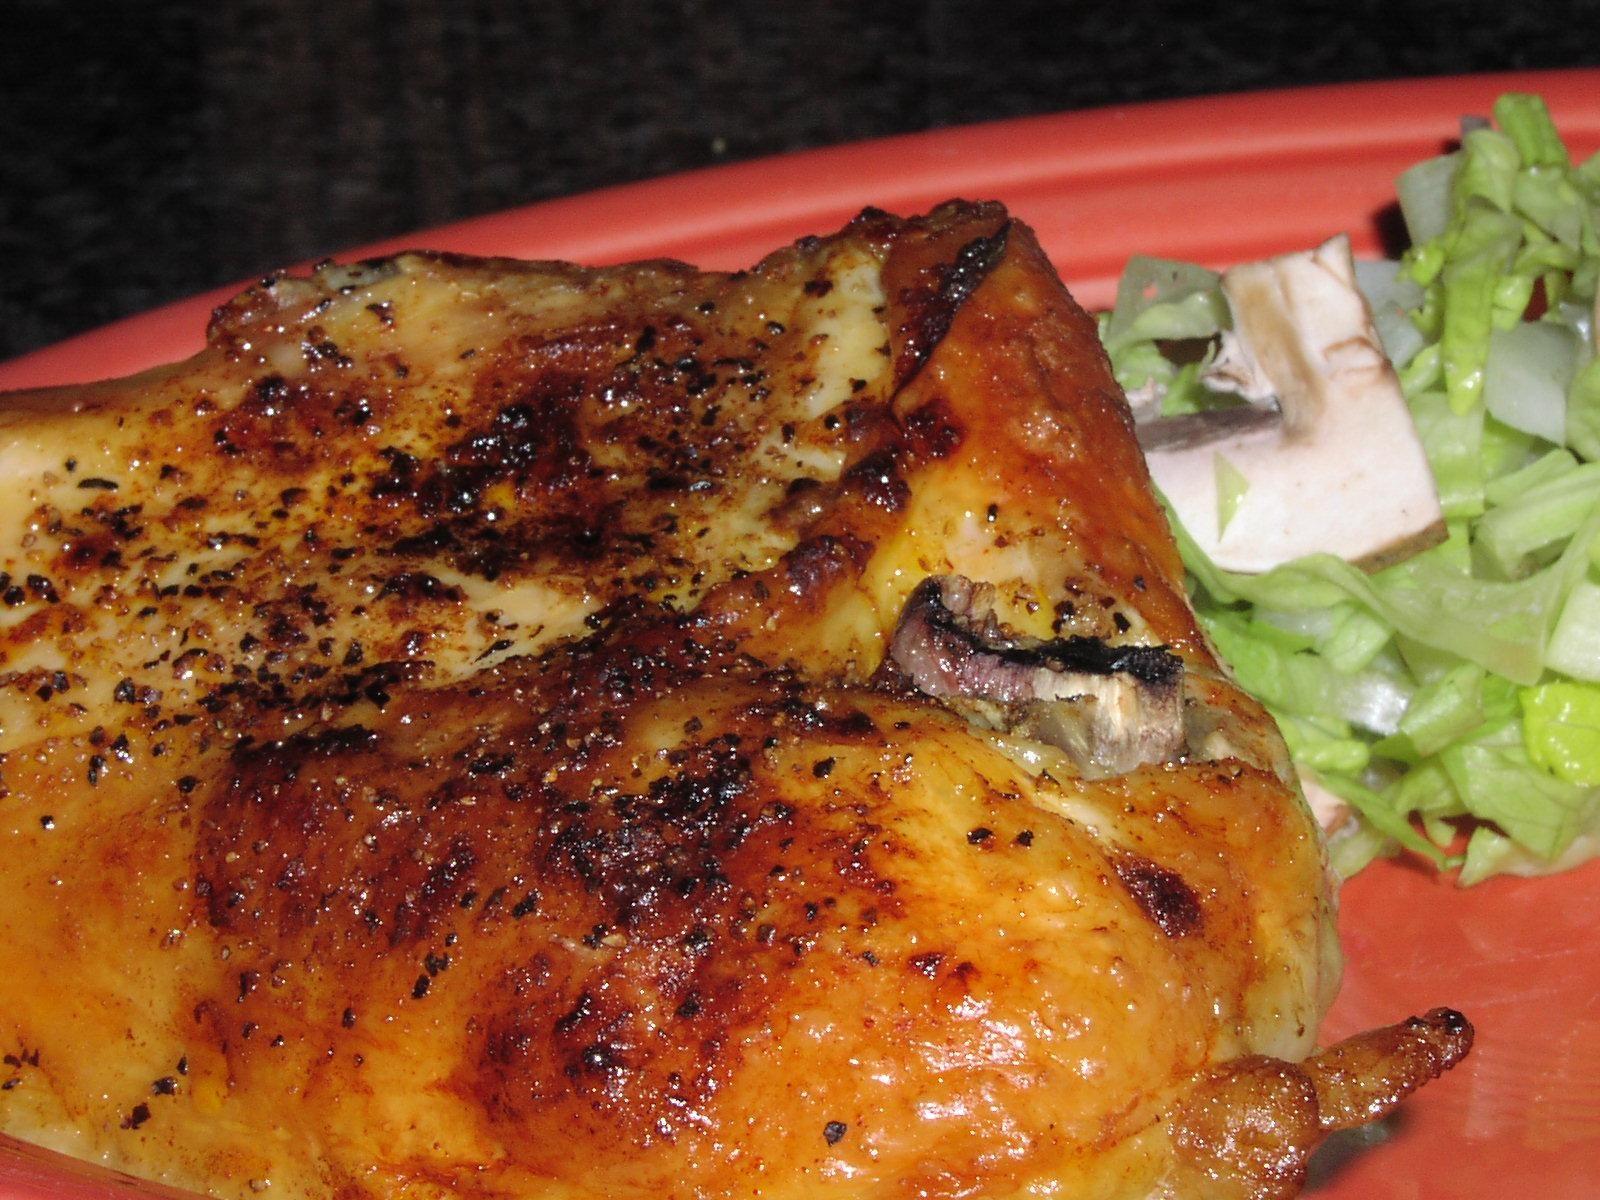 Bone in chicken breast easy recipes